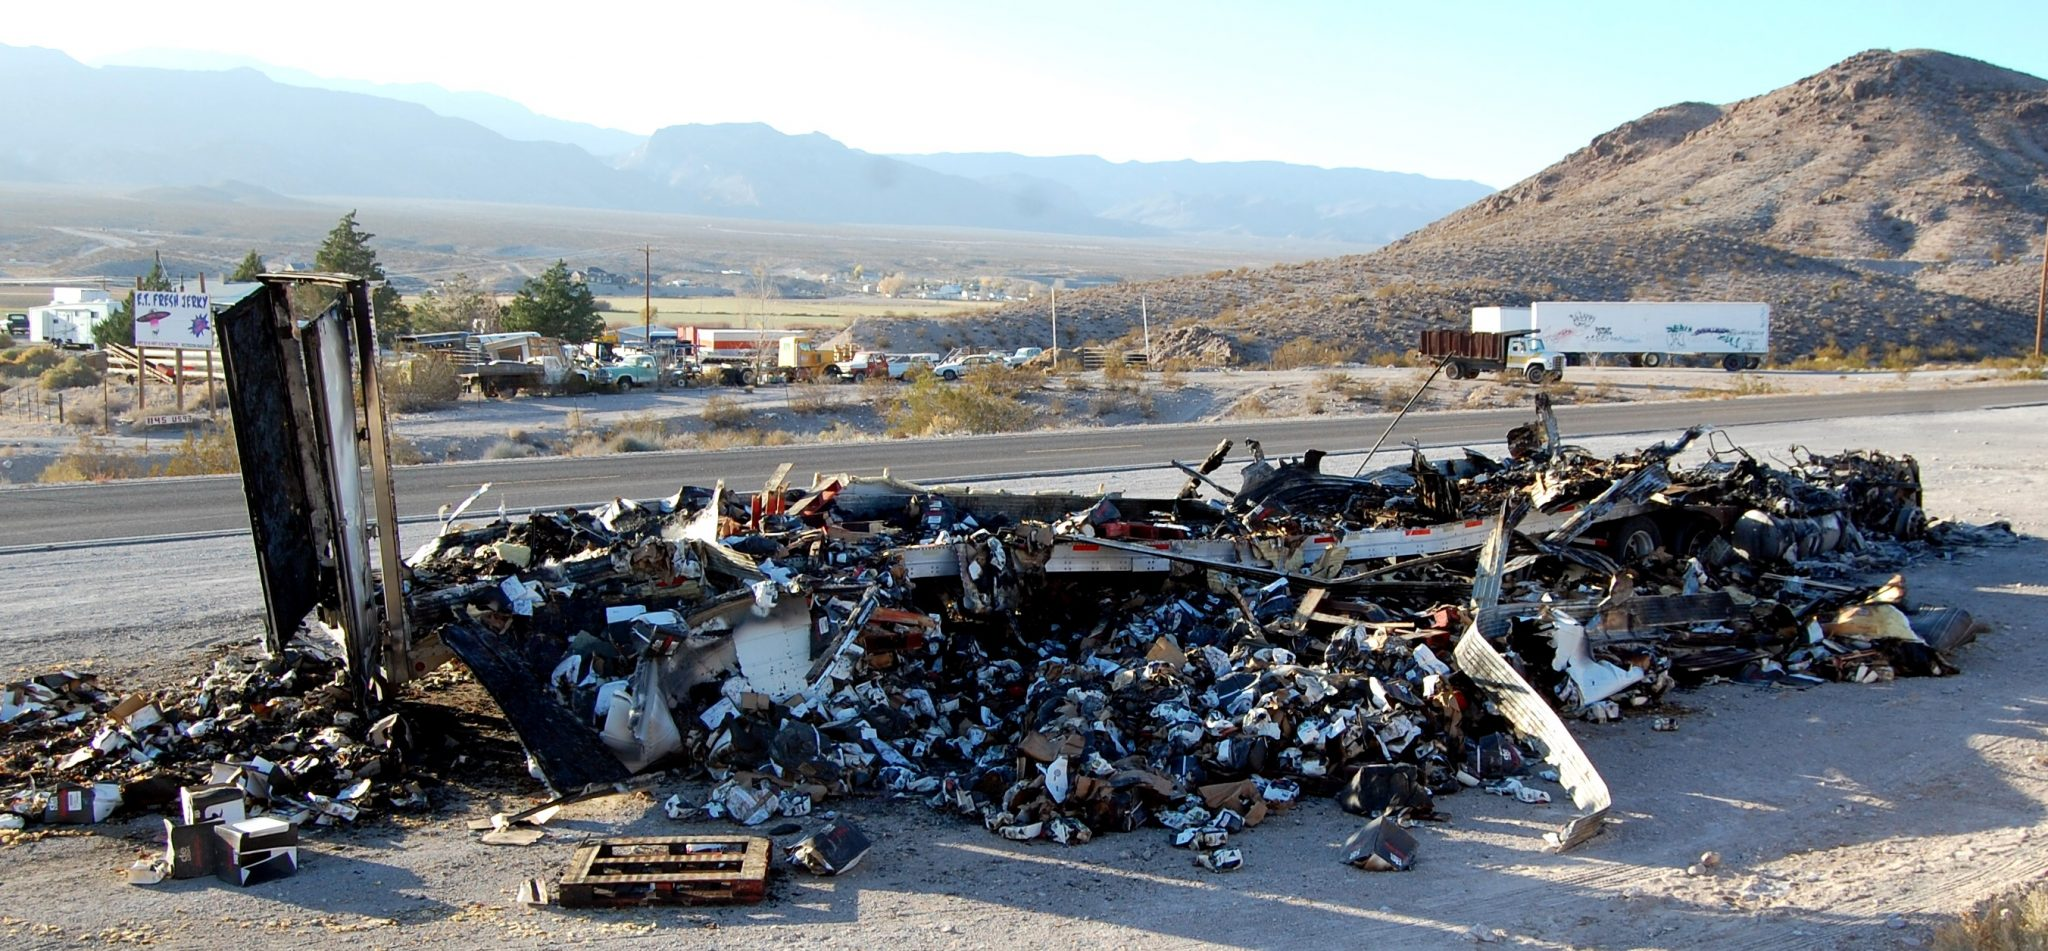 Semi truck destroyed in blaze